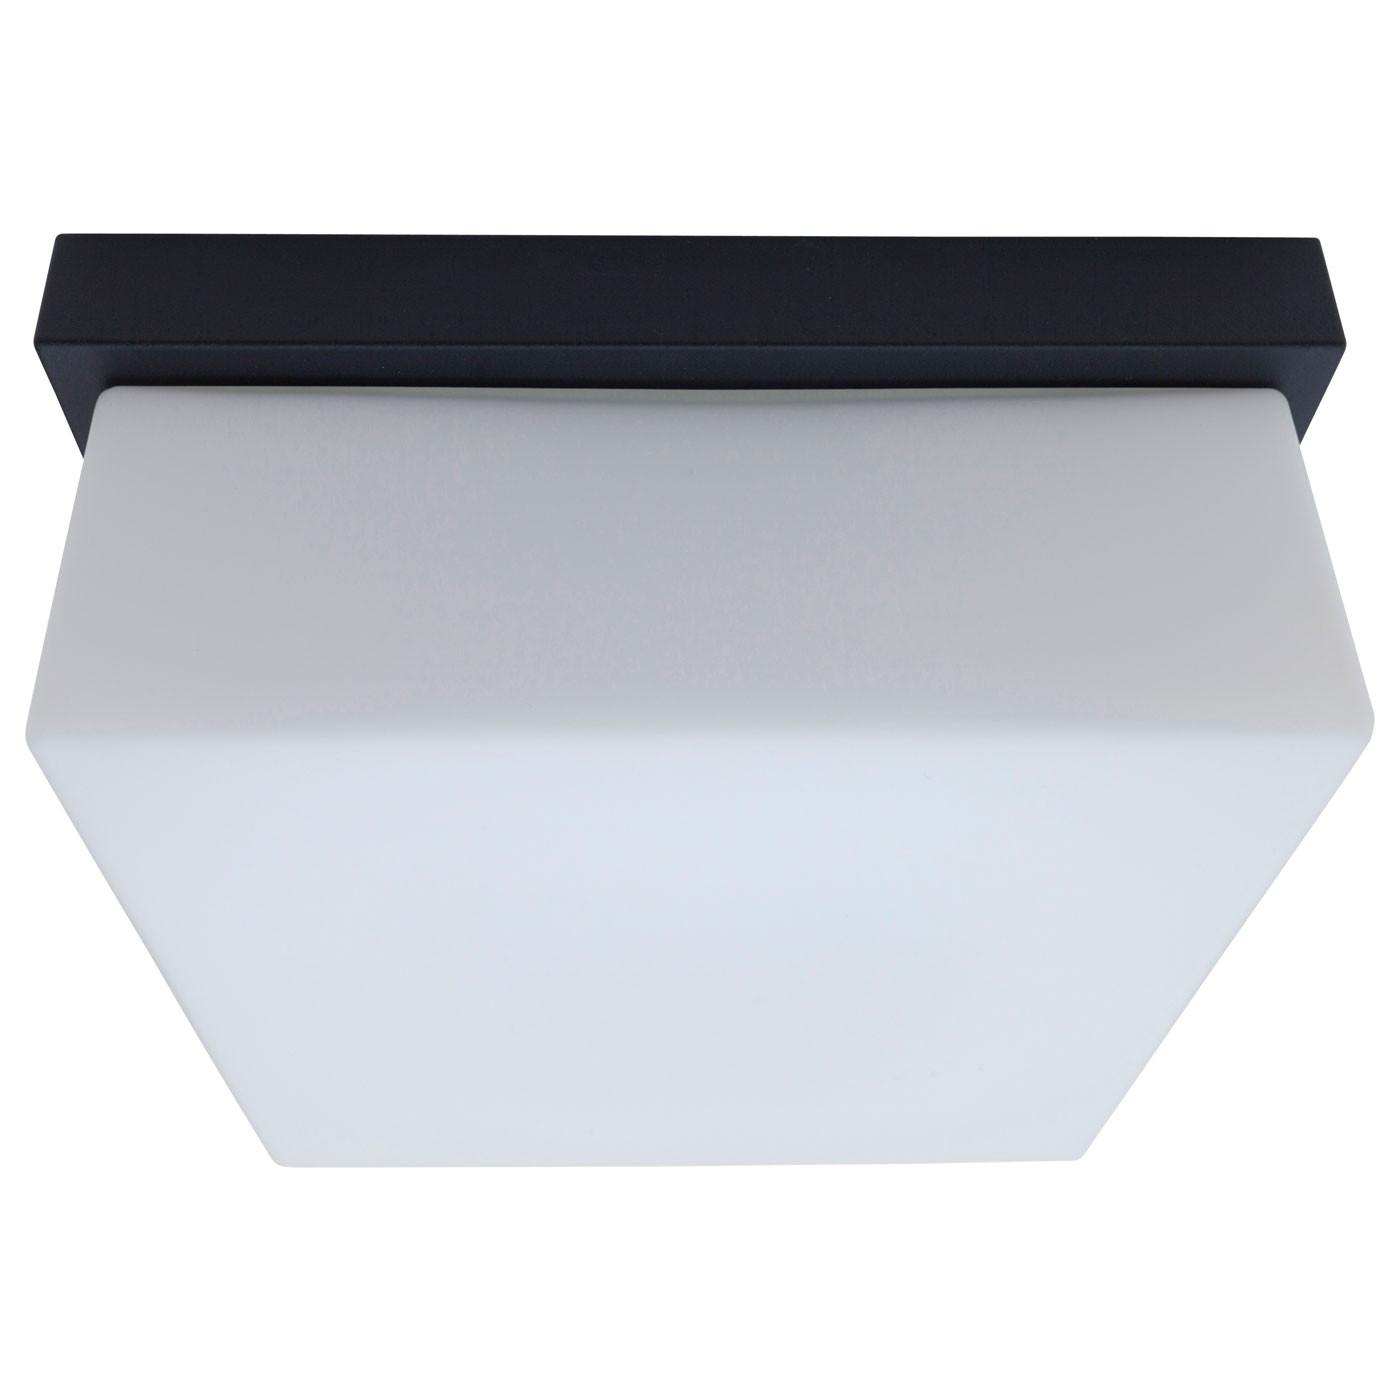 Bega 33032 LED Applique/Plafonnier